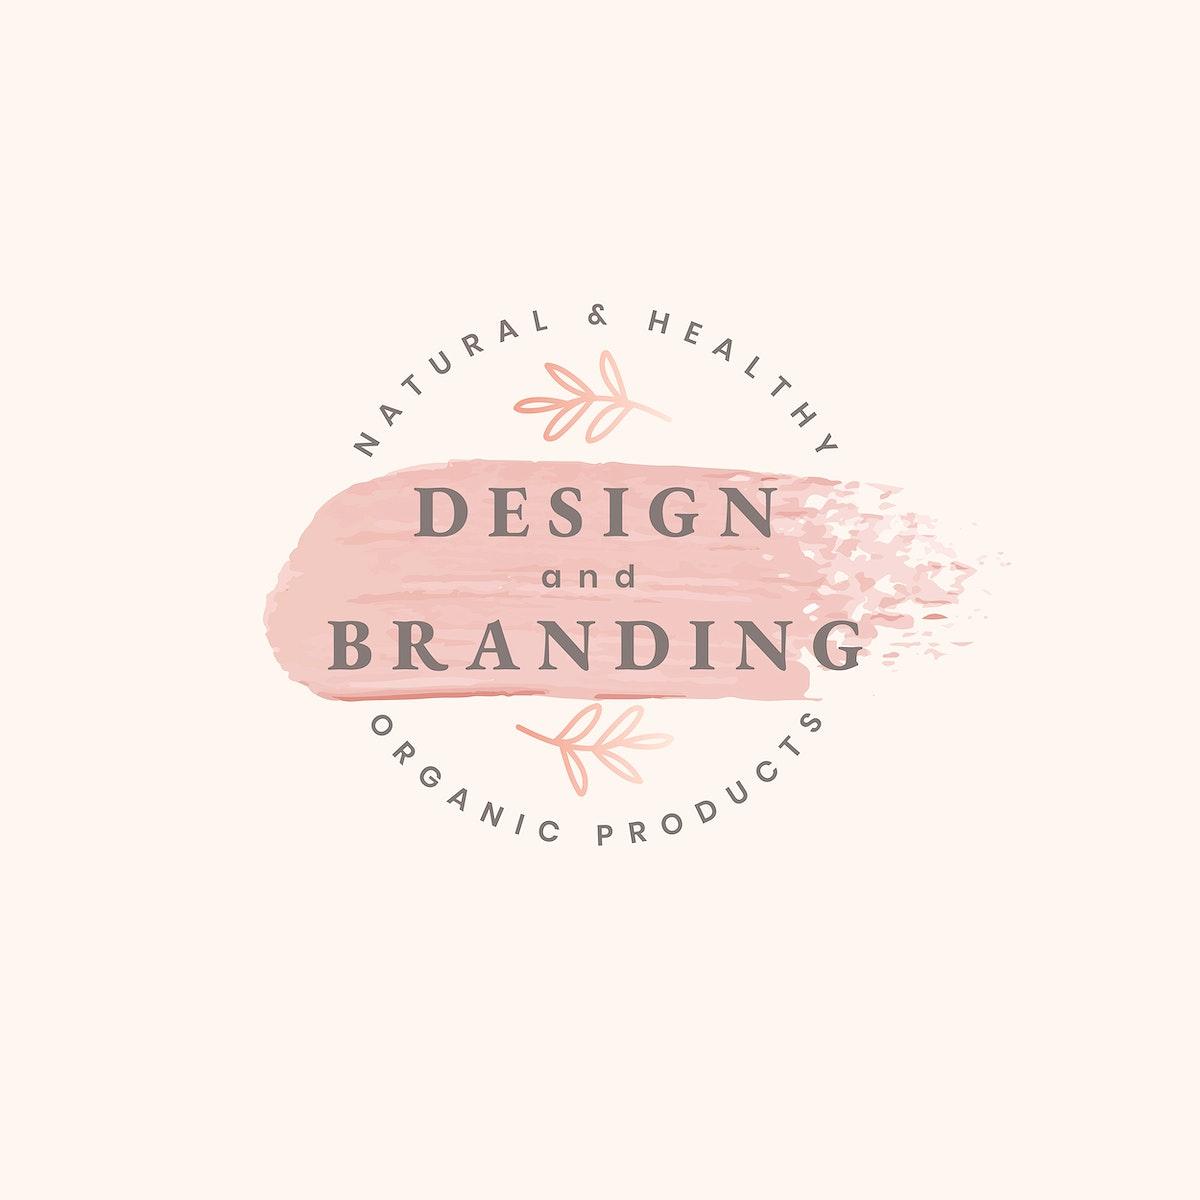 Design and branding minimal logo vector